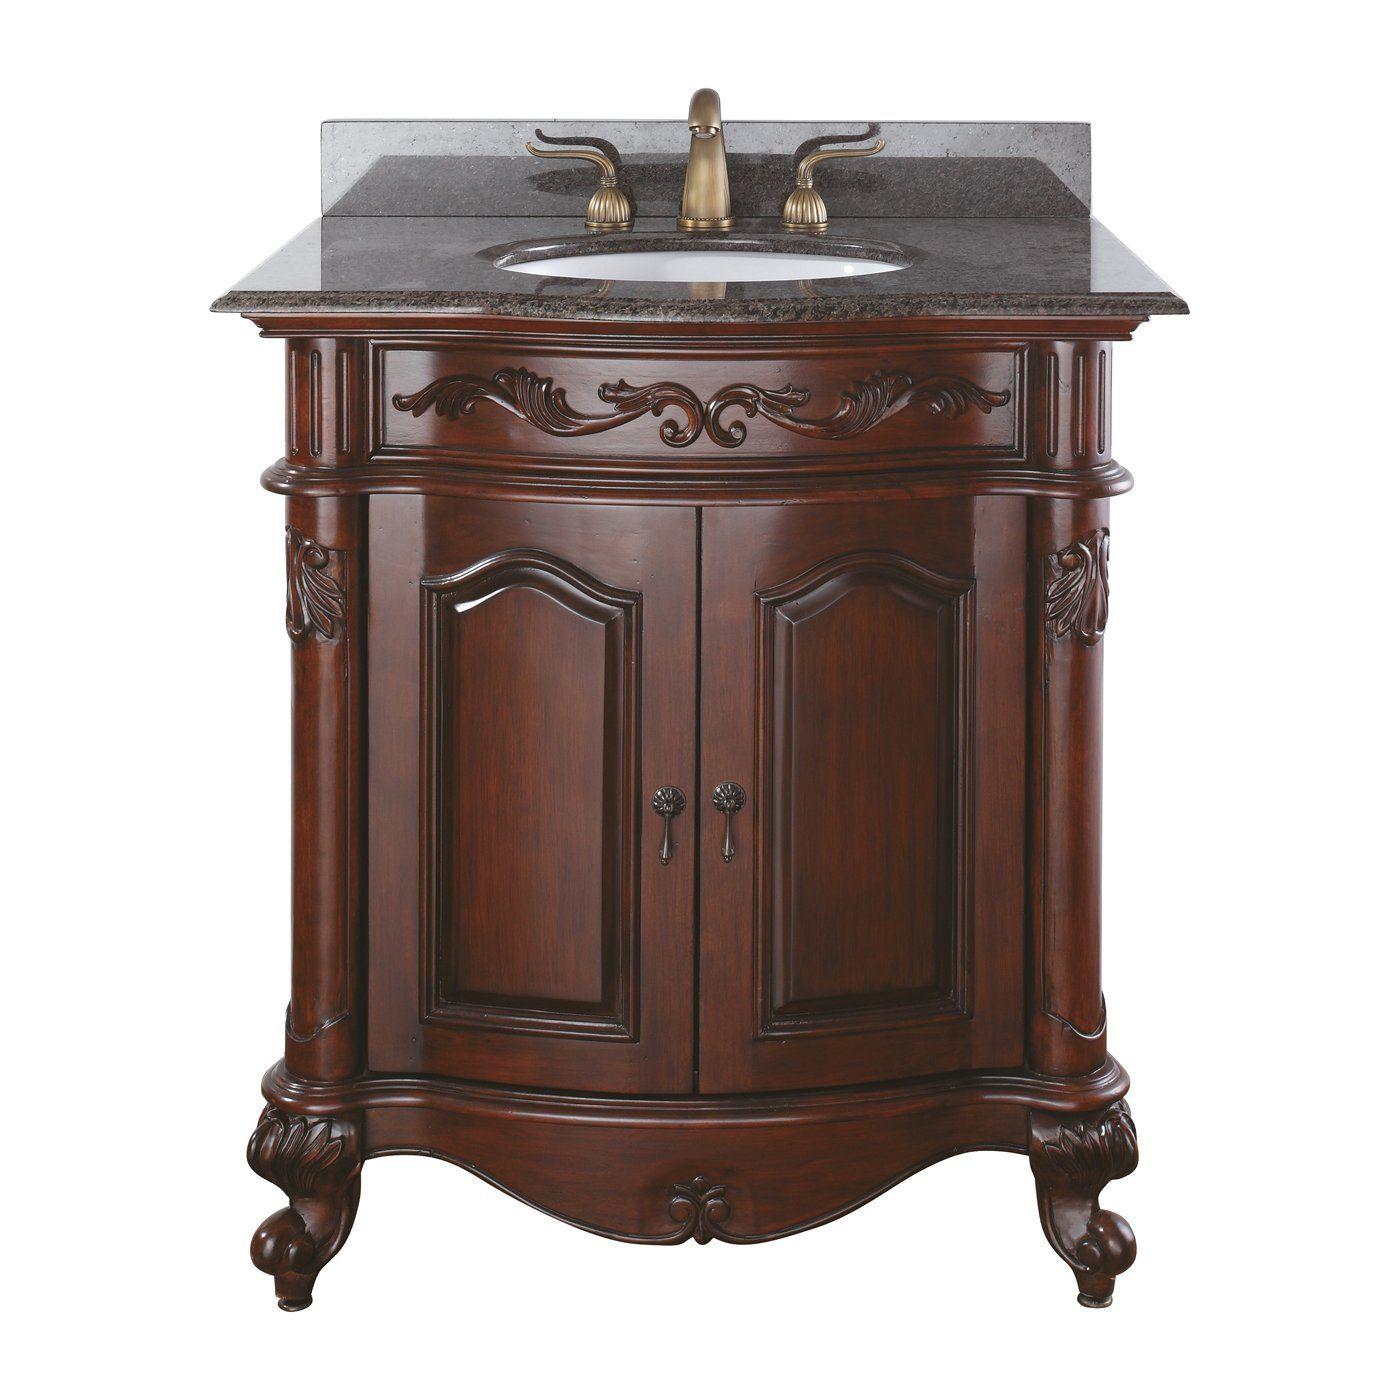 avanity provence v antique cherry bathroom vanity lowe s on lowes vanity id=49358